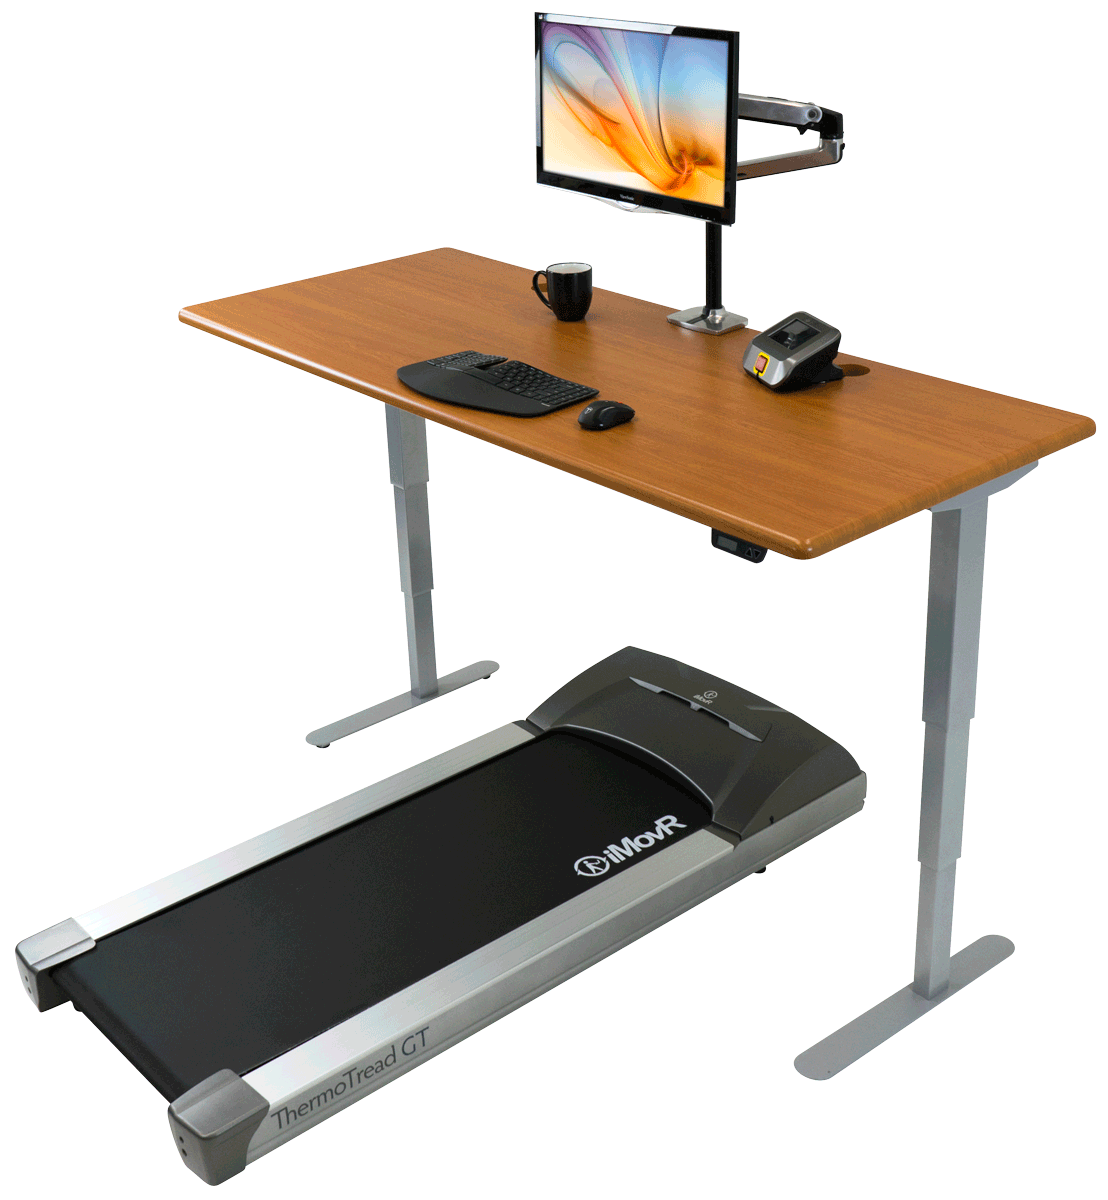 iMovR Energize Treadmill Desk